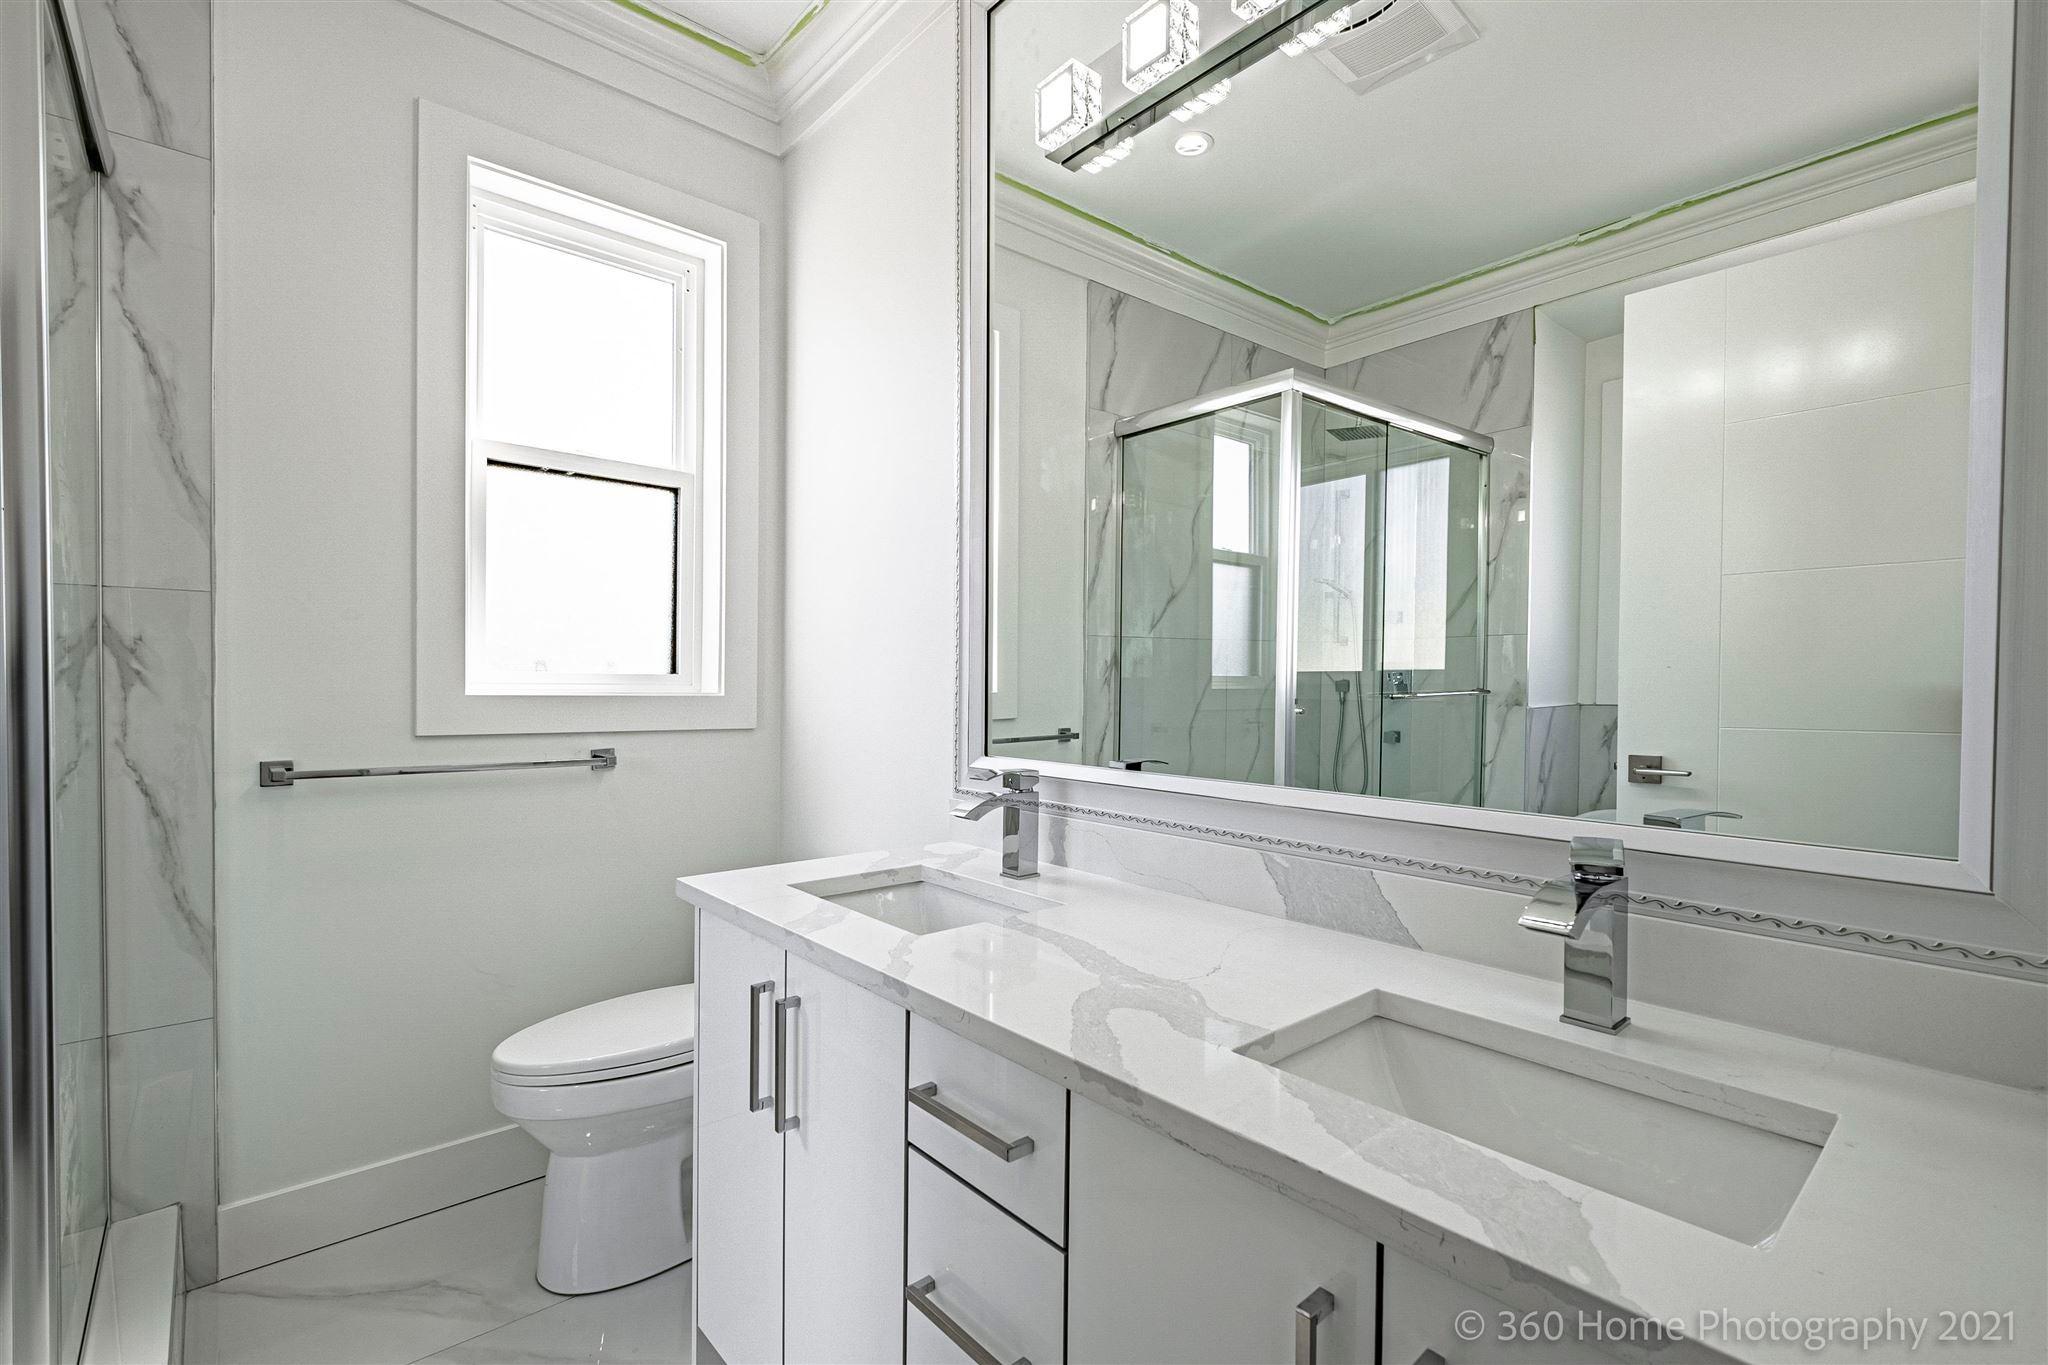 13050 101B AVENUE - Cedar Hills House/Single Family for sale, 5 Bedrooms (R2602208) - #24